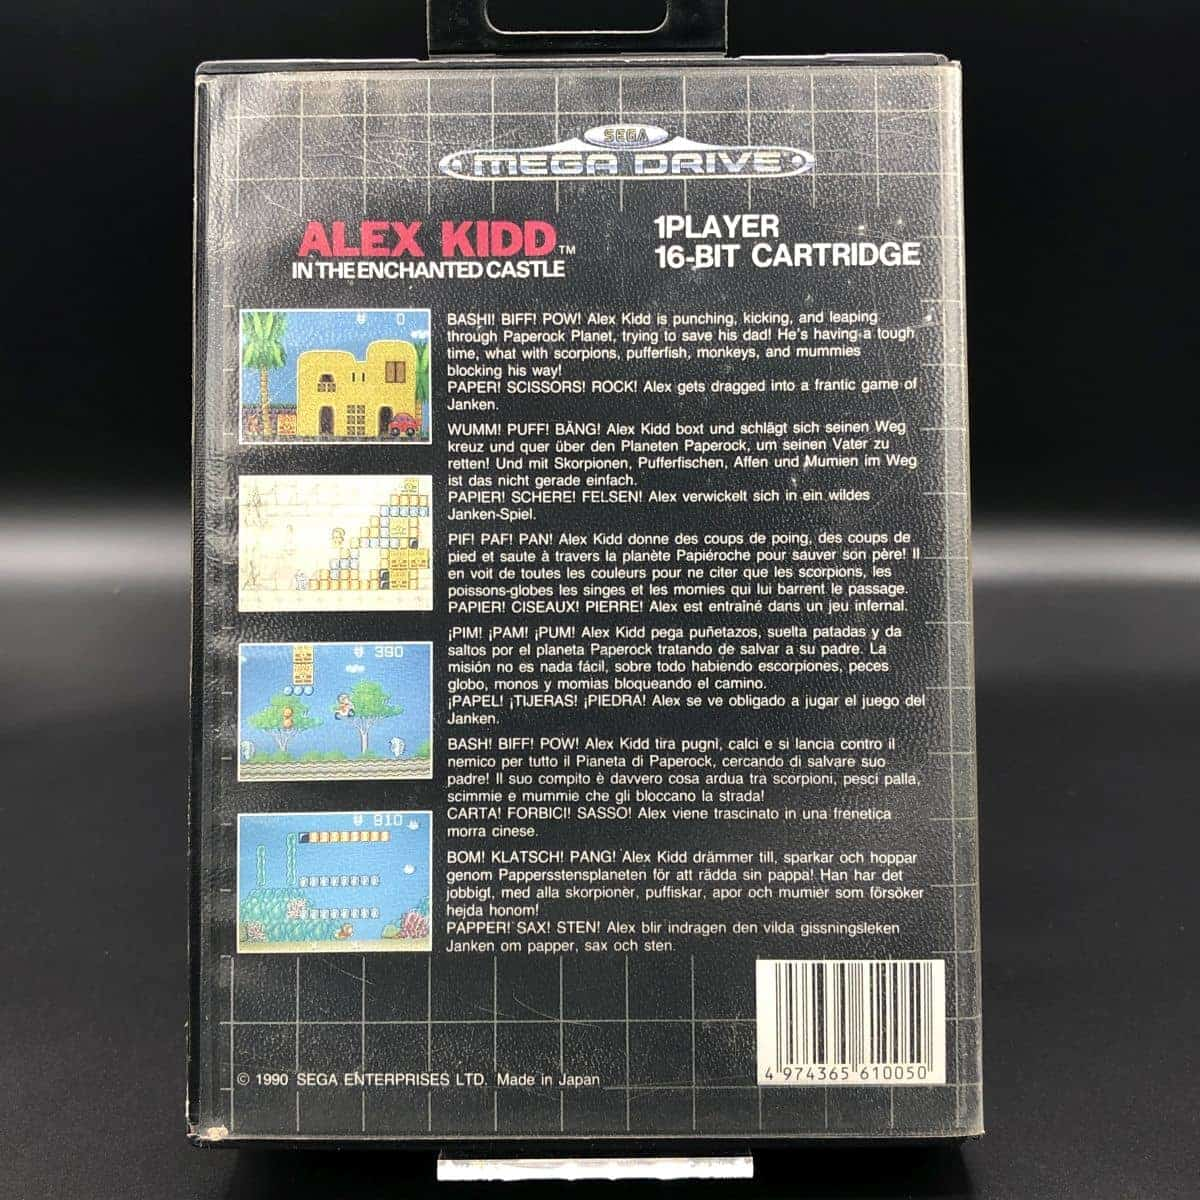 Alex Kidd in the Enchanted Castle (ohne Anleitung) (Gebrauchsspuren) Sega Mega Drive